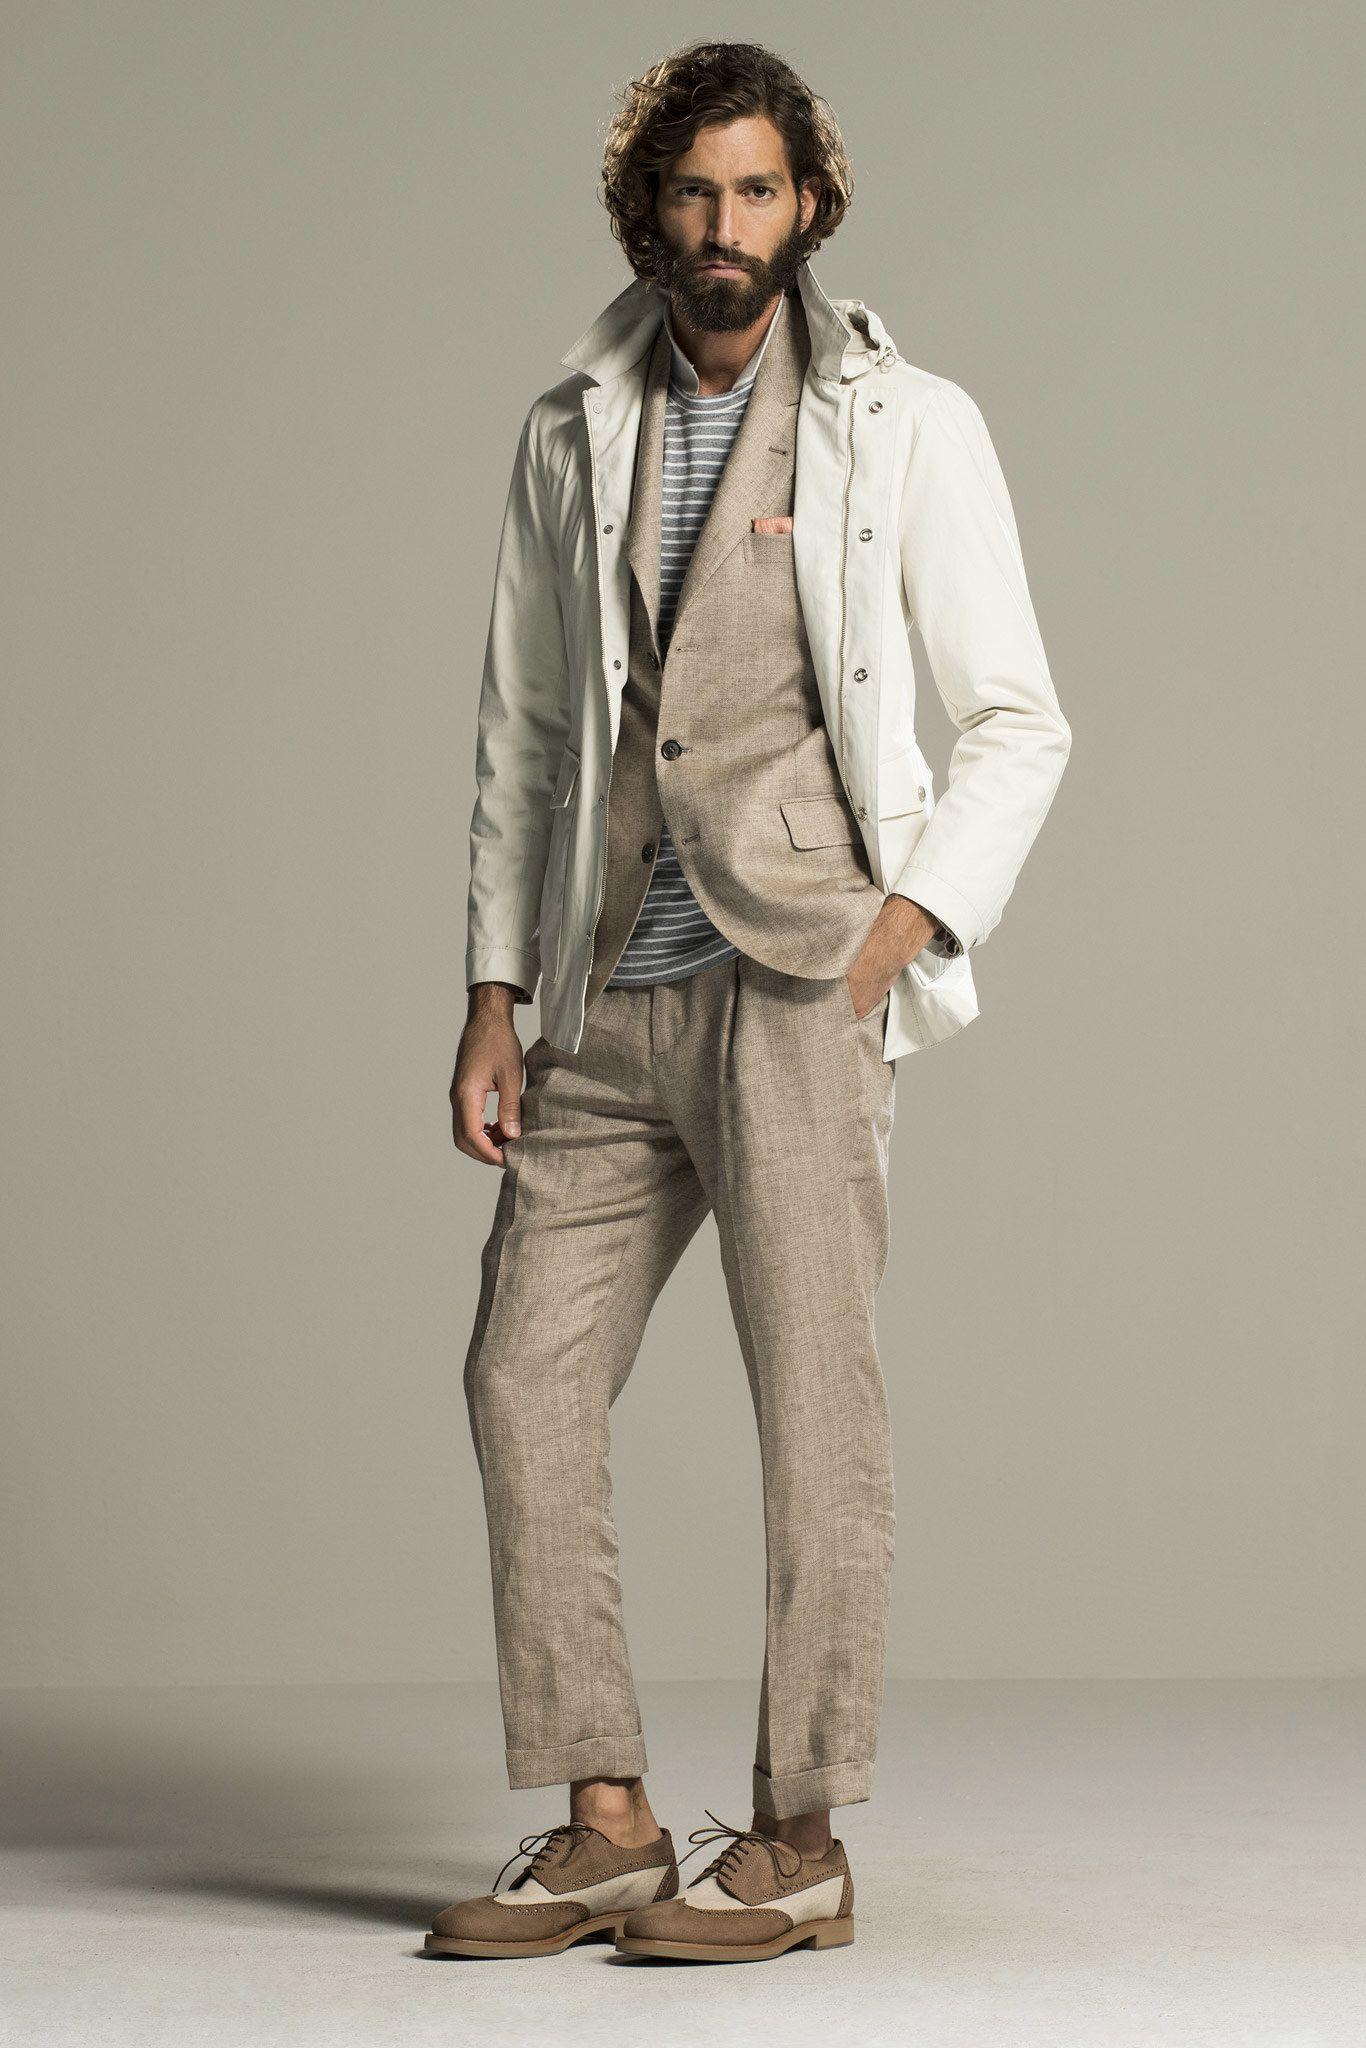 Brunello Cucinelli Spring 2016 Menswear Collection Photos - Vogue